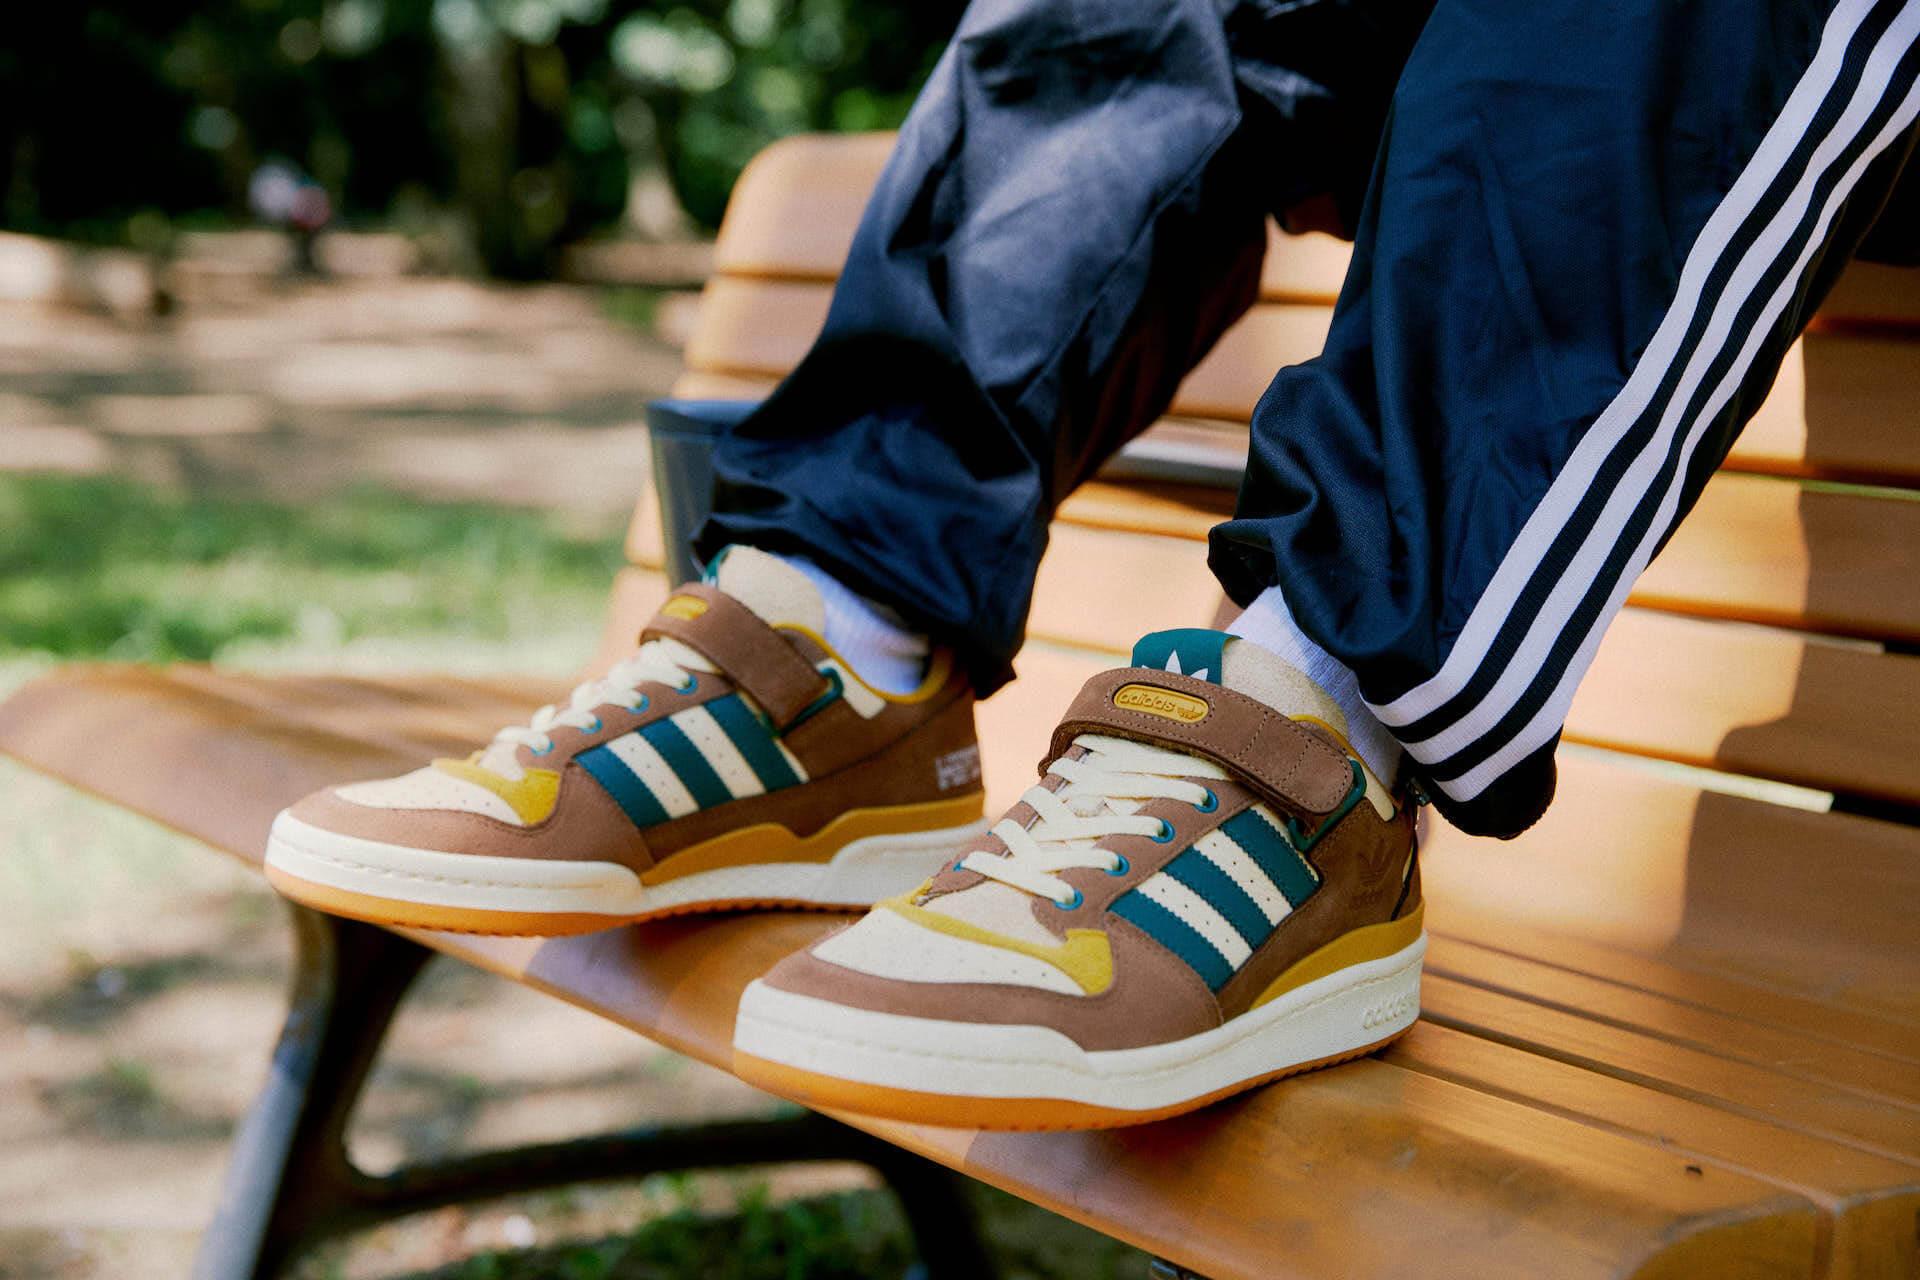 "adidas Originalsとatmosのコラボパック「""YOYOGI PARK"" PACK」が登場!代々木公園をモチーフにしたZX 8000、FORUMの2足が発売 life210802_adidasoriginals_yoyogipark_3"